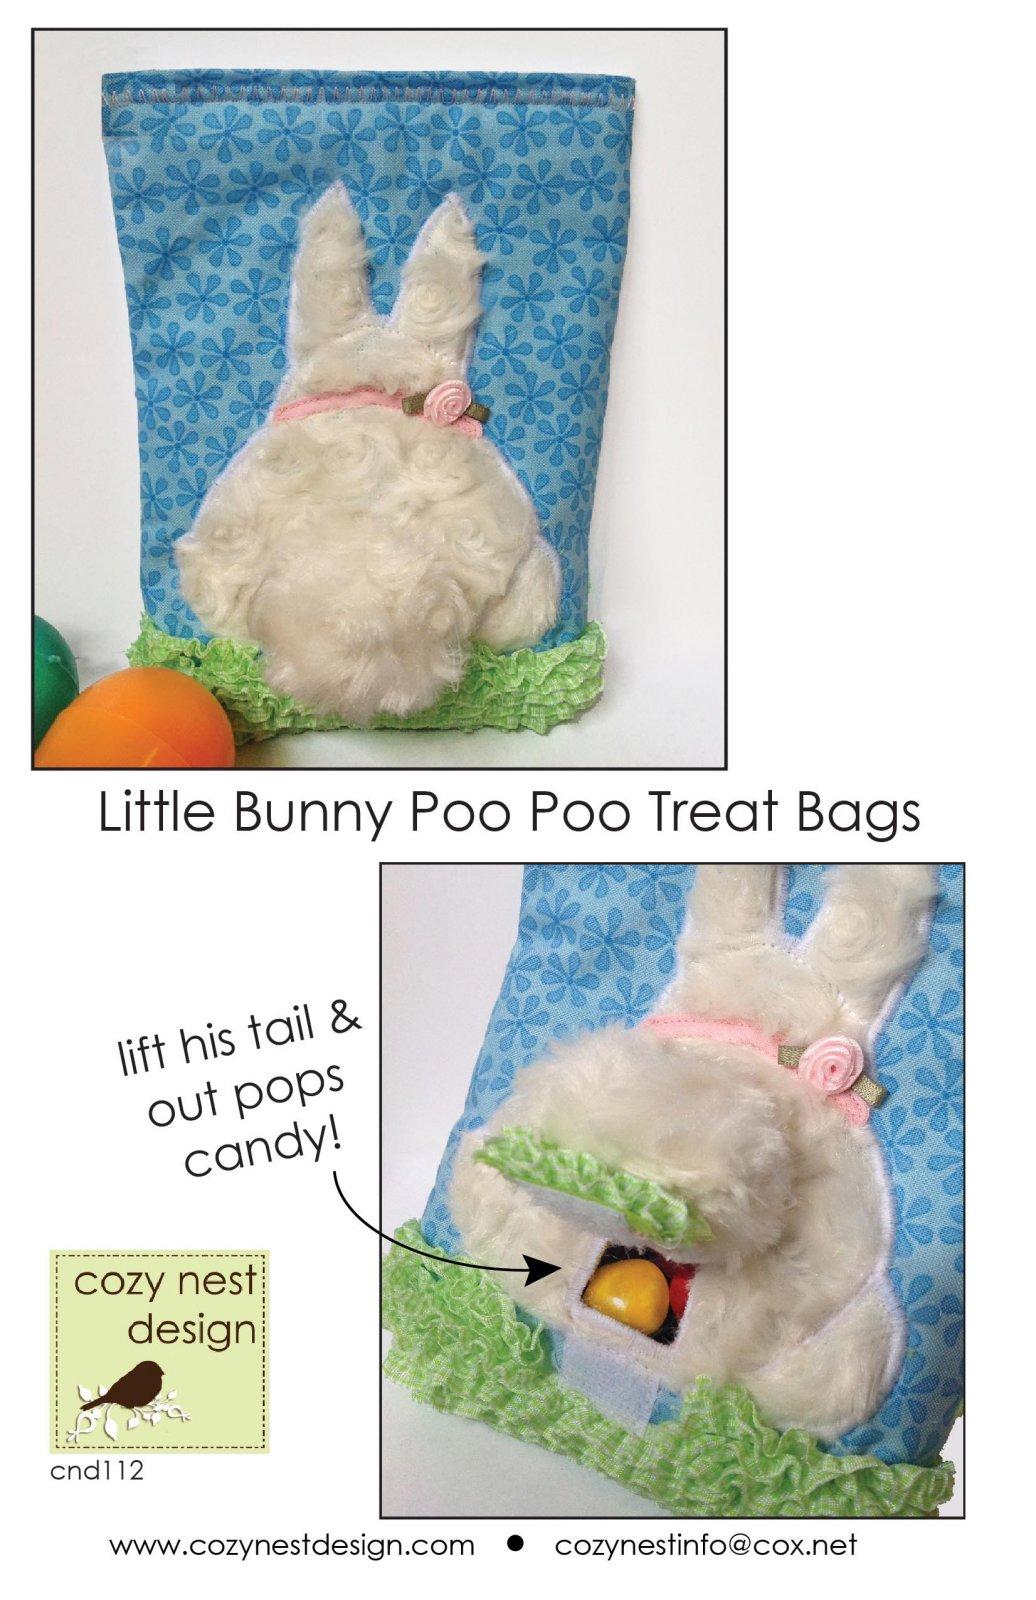 Little Bunny Poo Poo Treat Bag